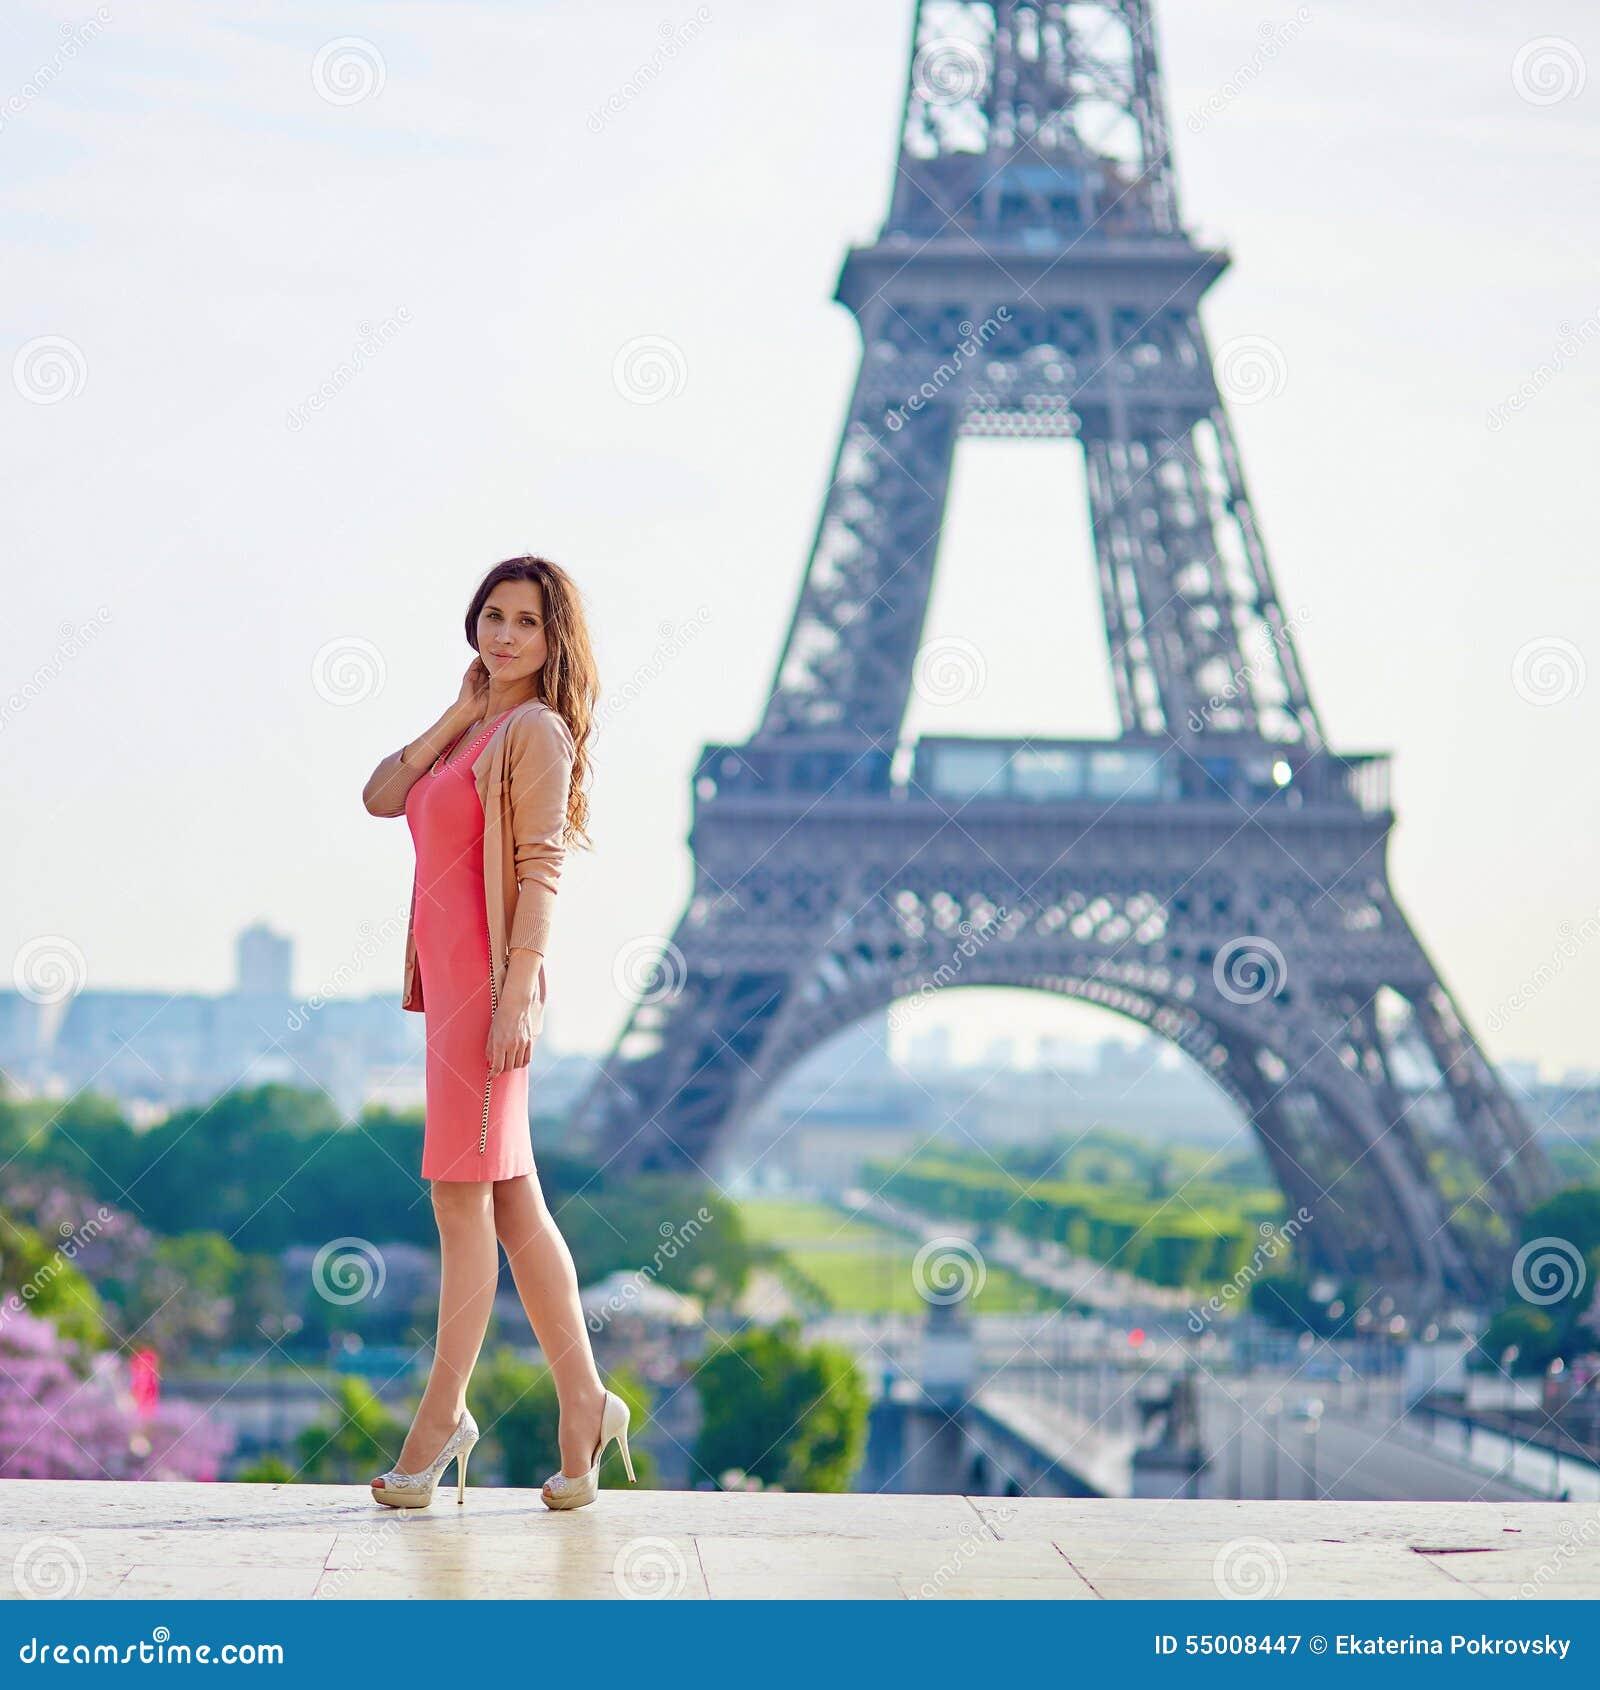 jovem-mulher-bonita-perto-da-torre-eiffel-55008447.jpg